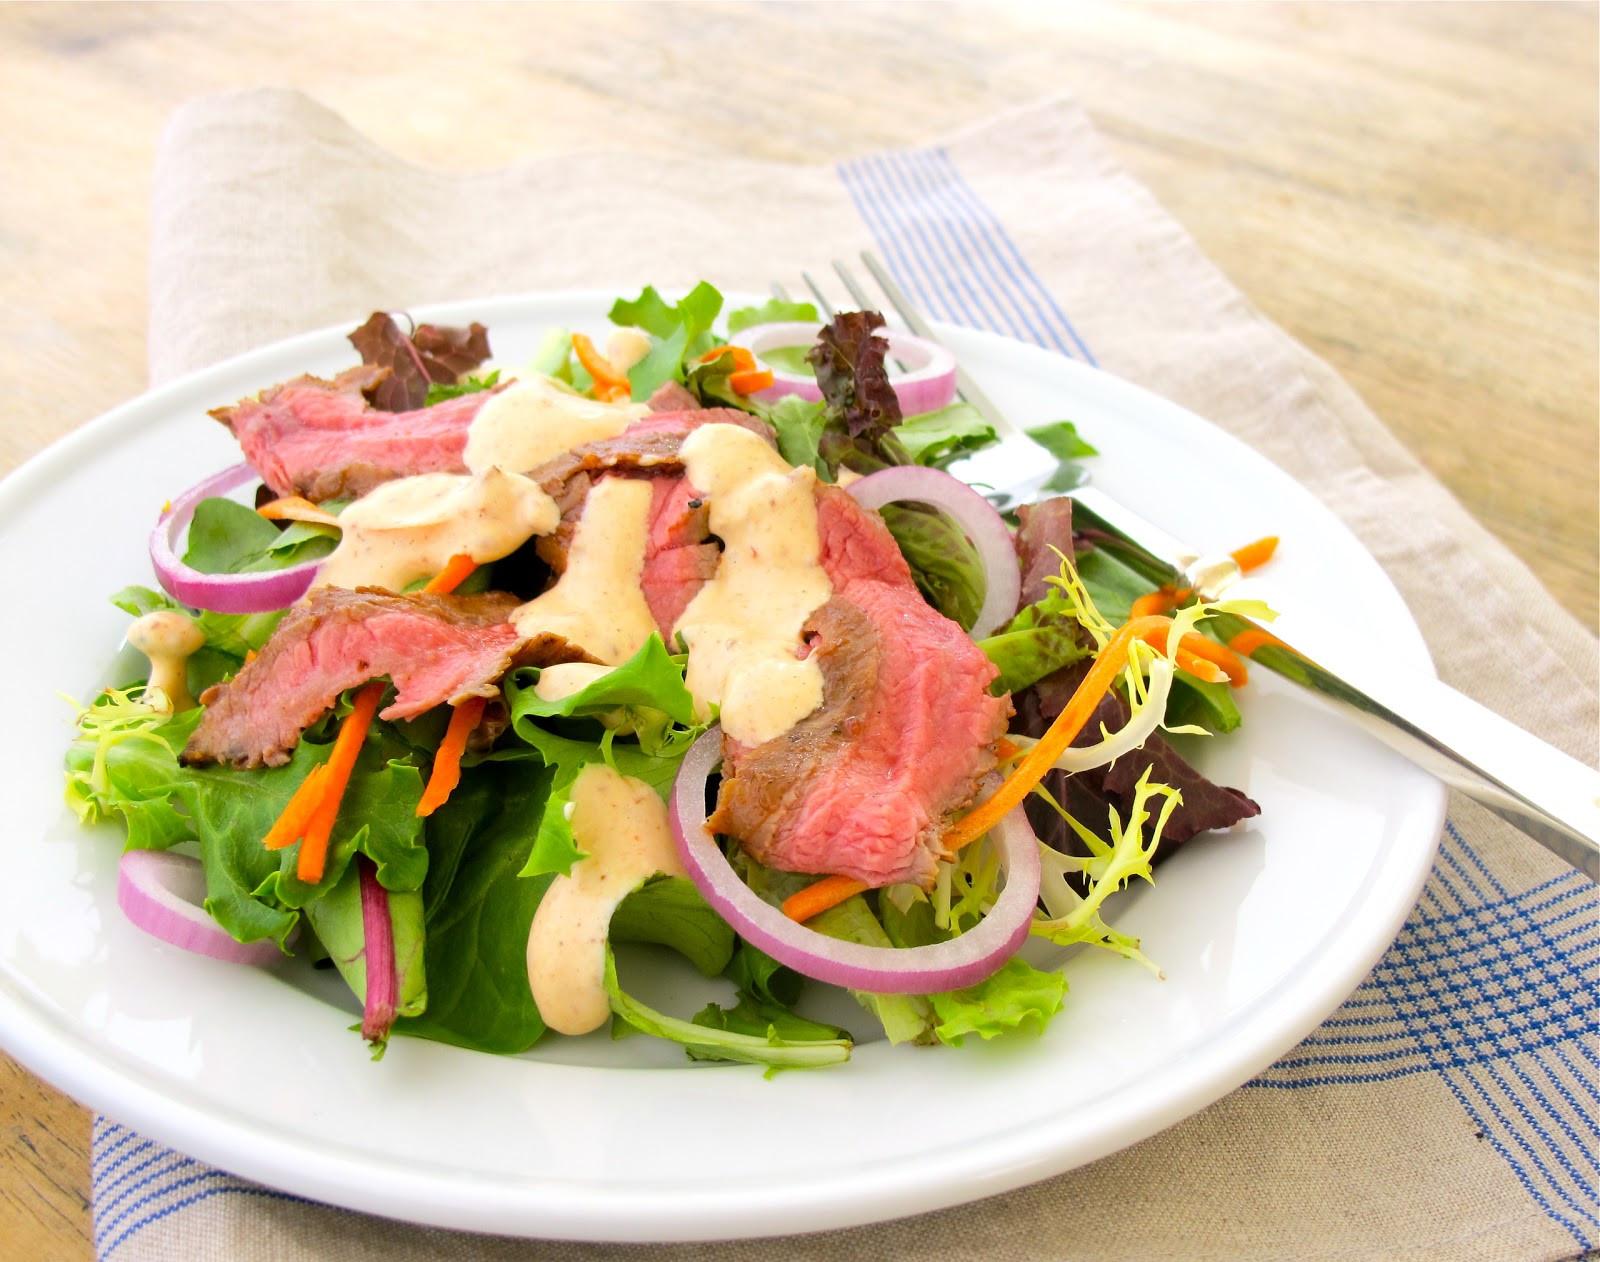 Light Summertime Dinners  Jenny Steffens Hobick Chipotle Grilled Steak Salad